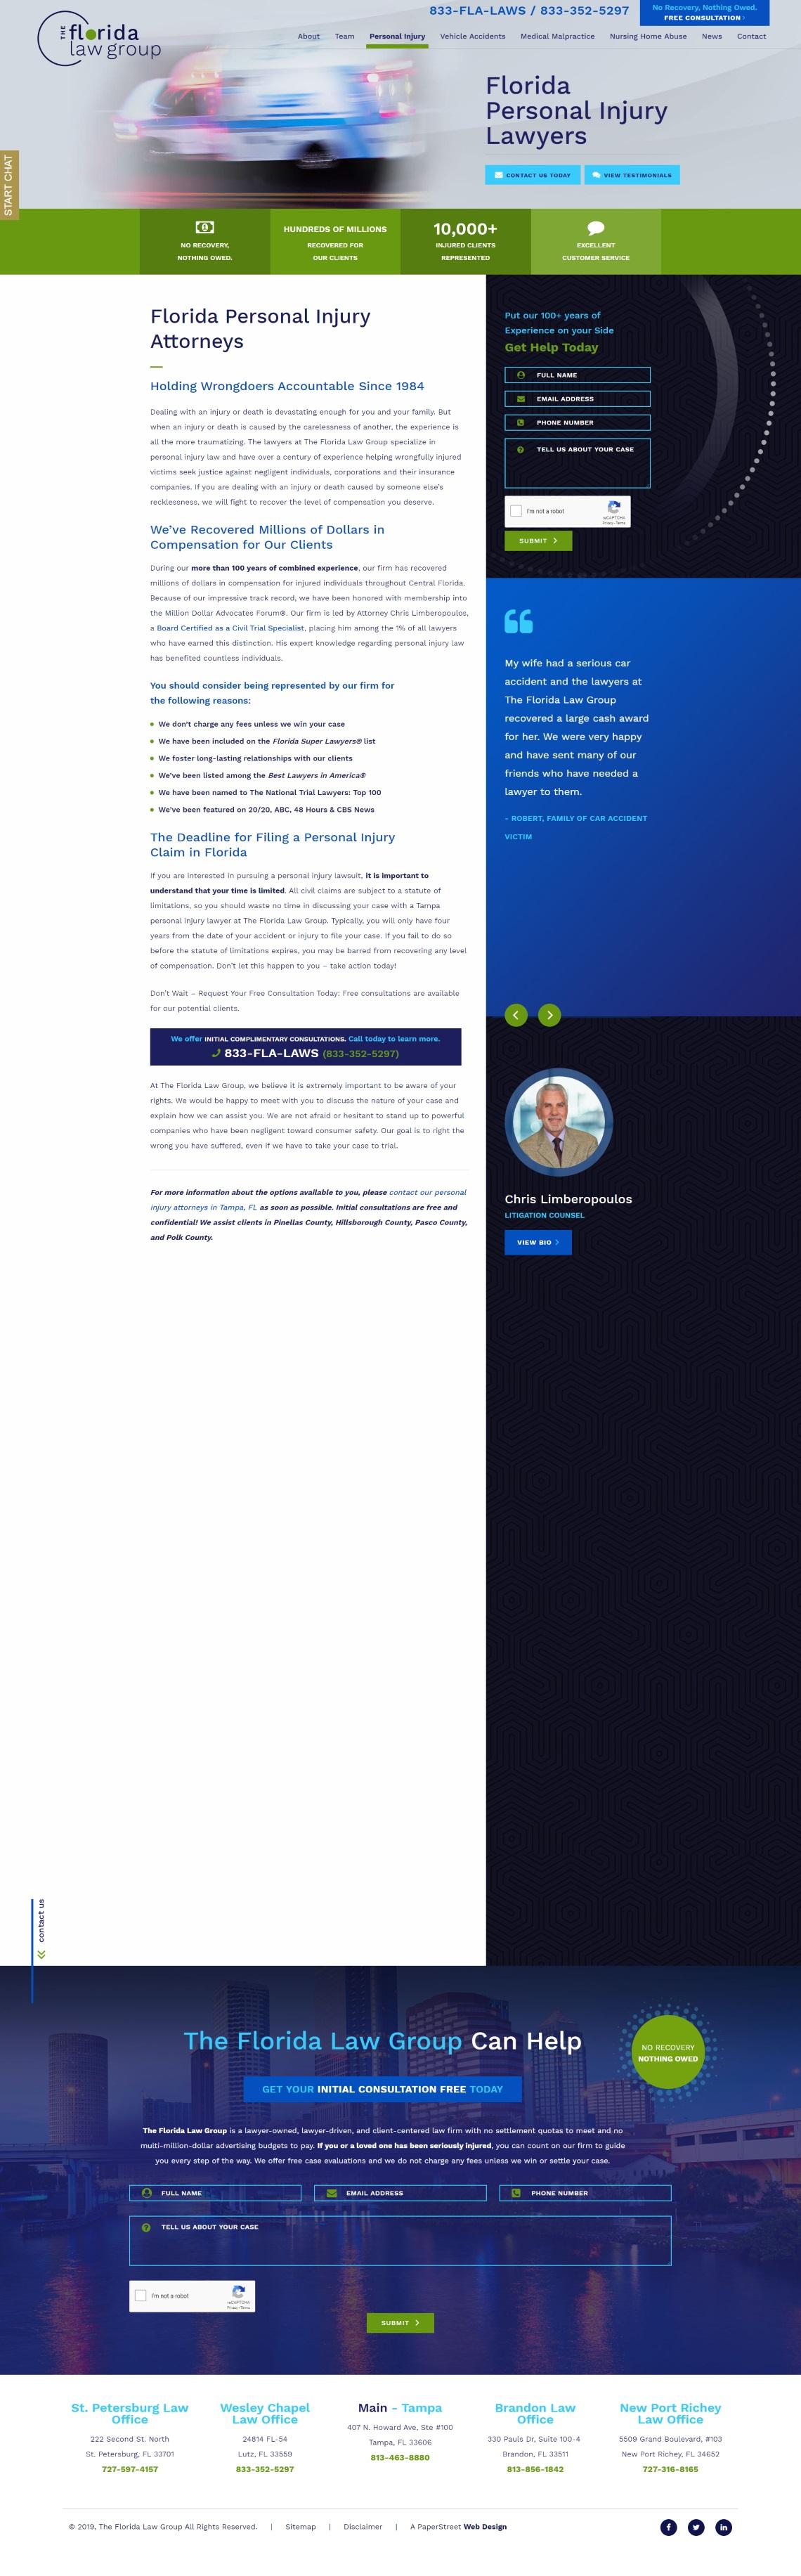 The Florida Law Group Screenshot